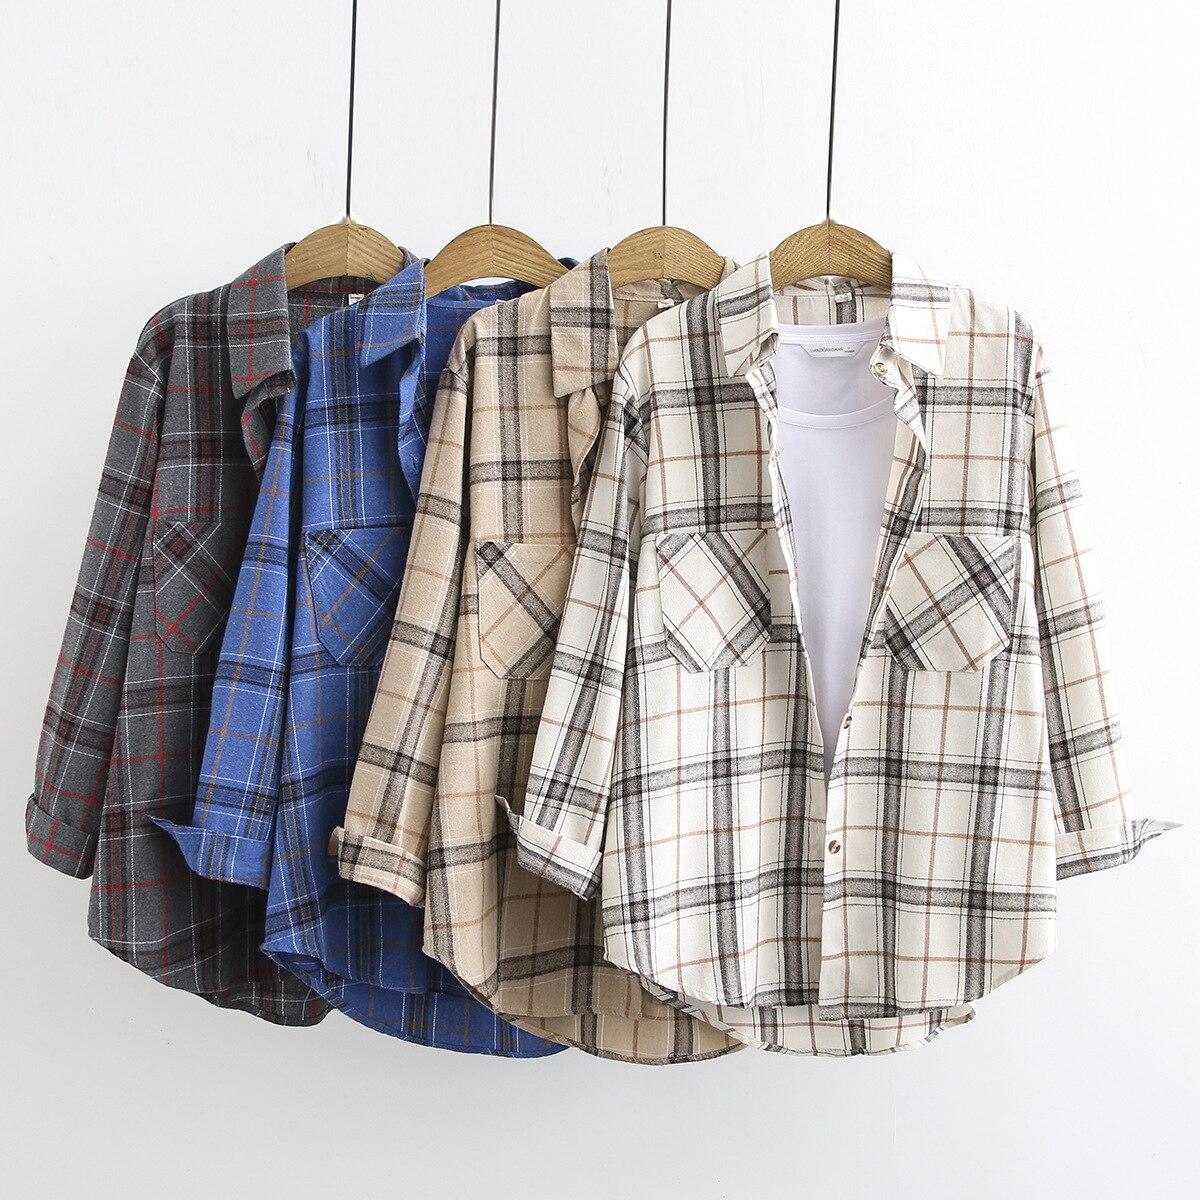 2020 ZSIIBO Plaid Shirt Long Sleeve Women's Summer Loose Casual Sun Clothes Splicing Plaid Ladies Shirt